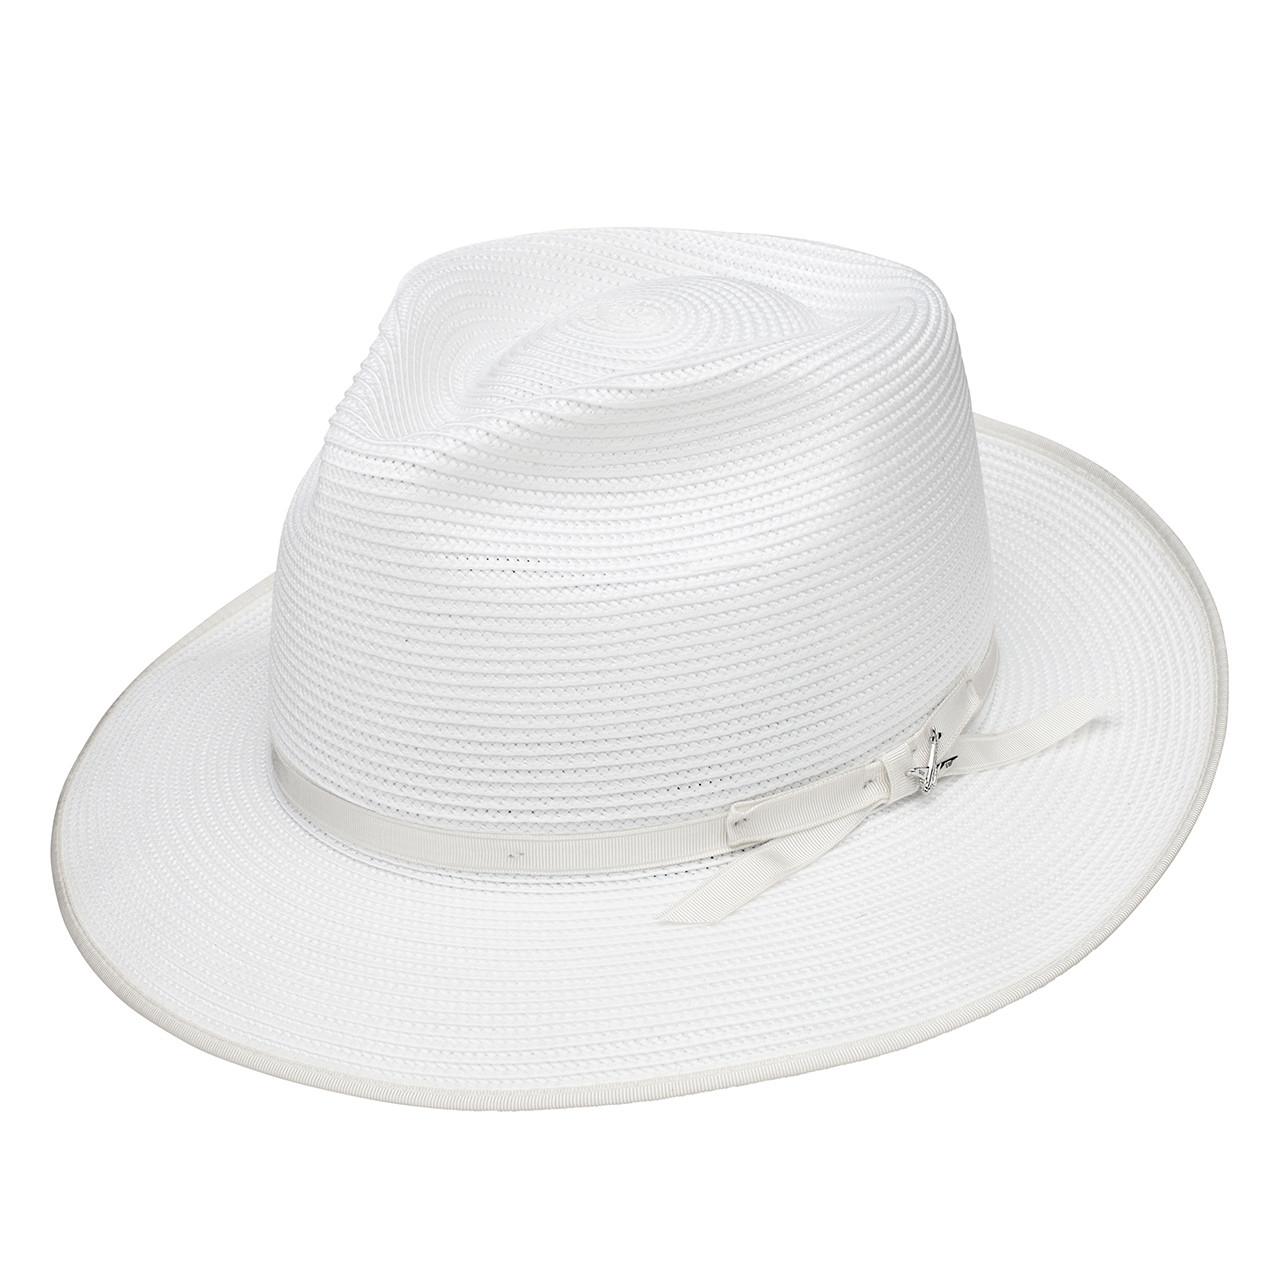 Stetson Stratoliner White Florentine Milan Firm Finish Straw Hat 87db1dc7777